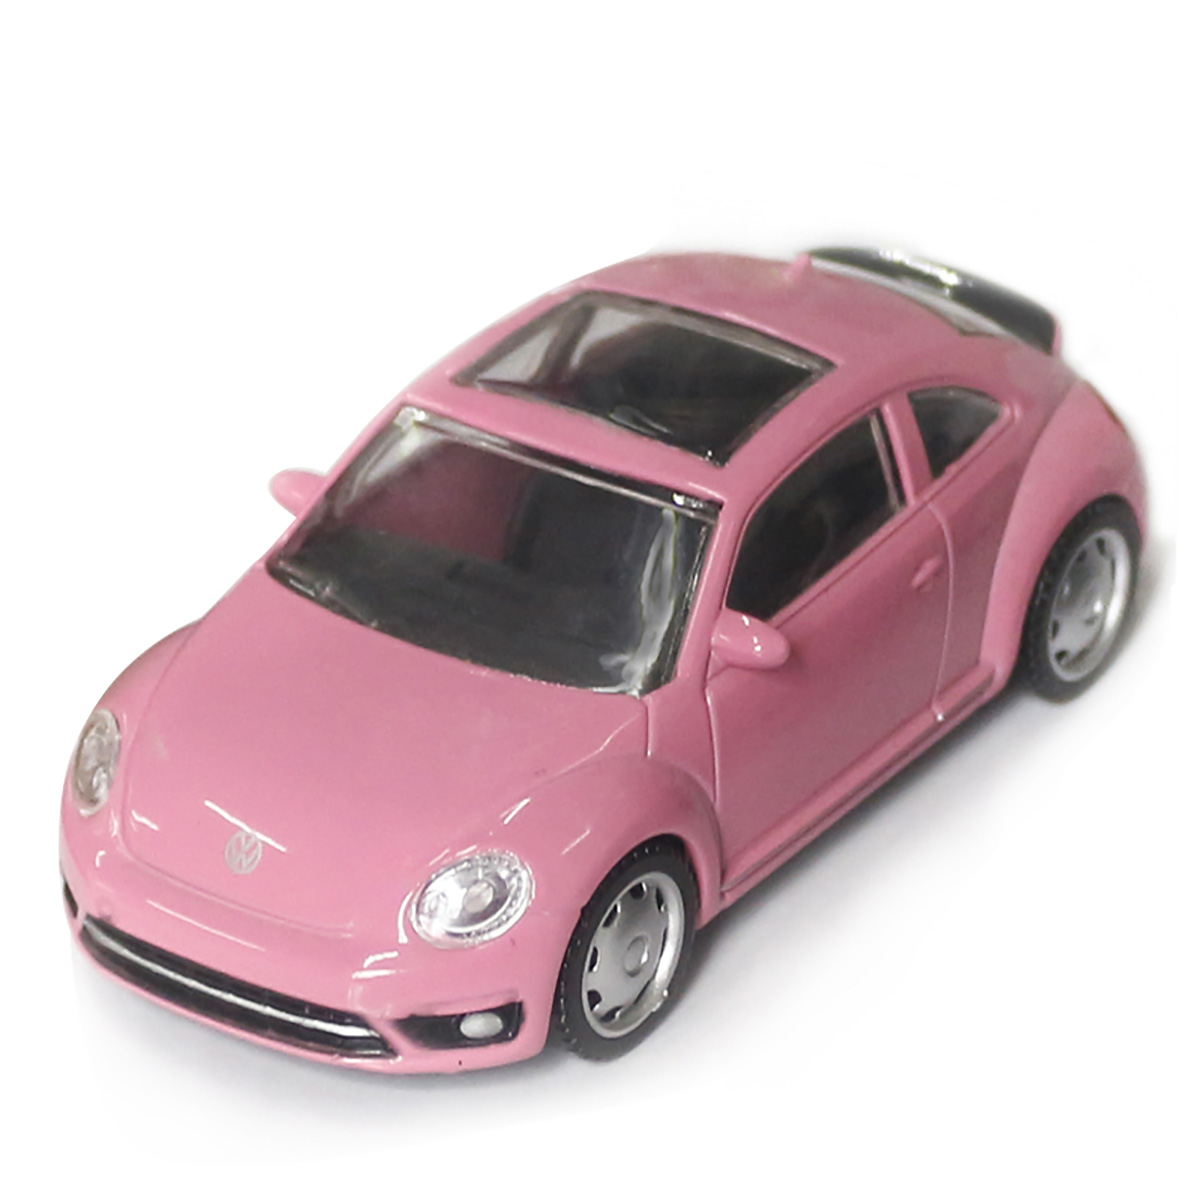 Masinuta Rastar Volkswagen Beetle, Roz, 1:43